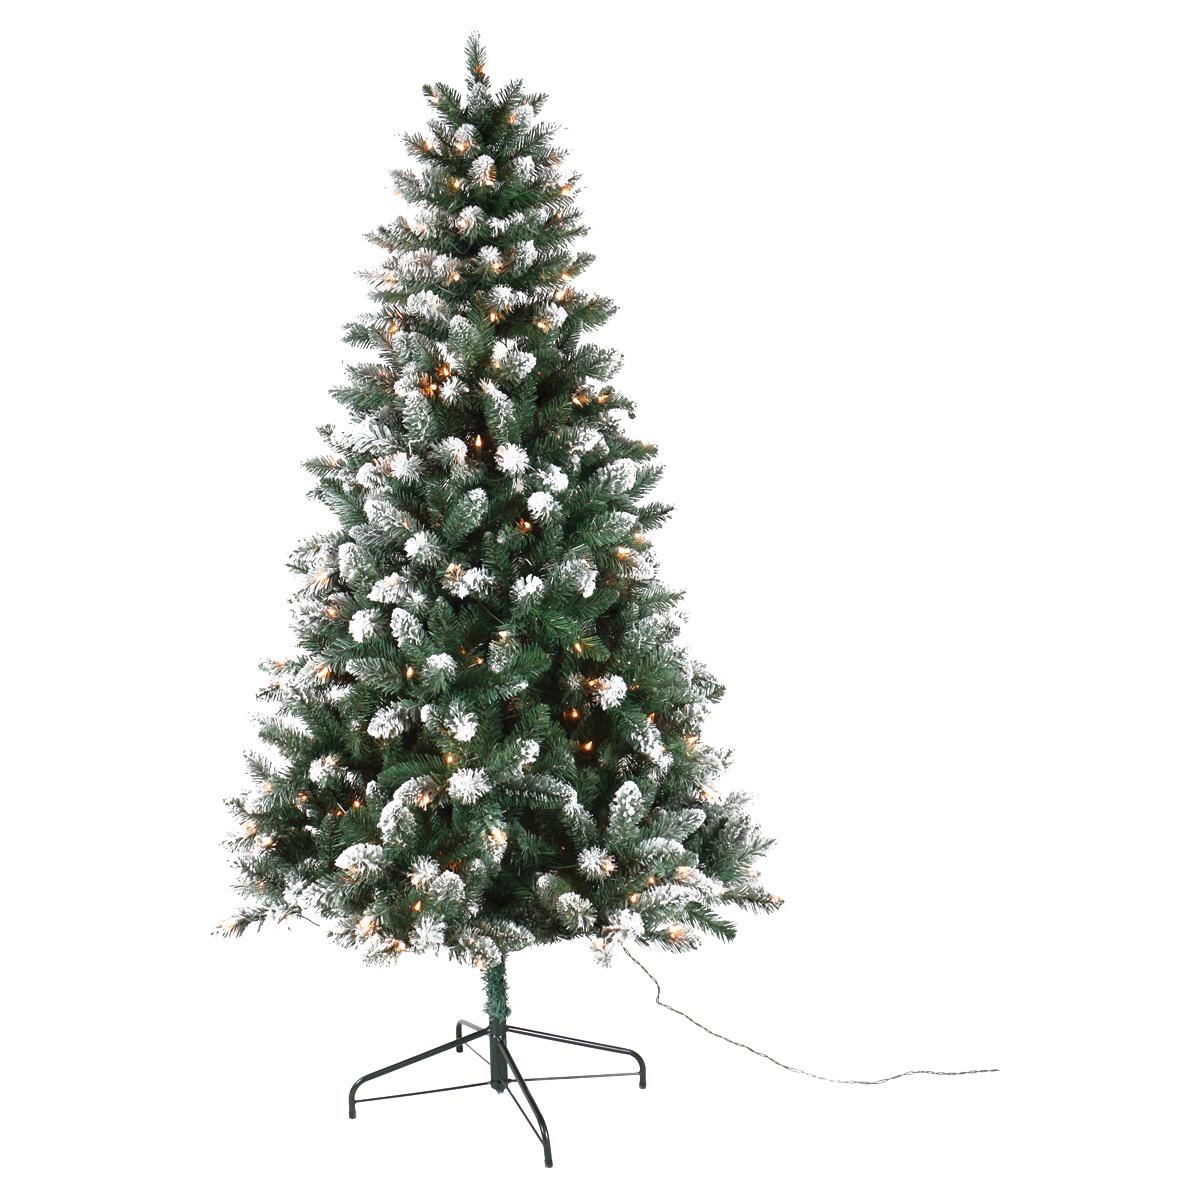 Picture of Santas Forest 27470 Pre-Lit Tree, 7 ft H, Tamarack Family, 110 V, Mini Bulb, Clear Light